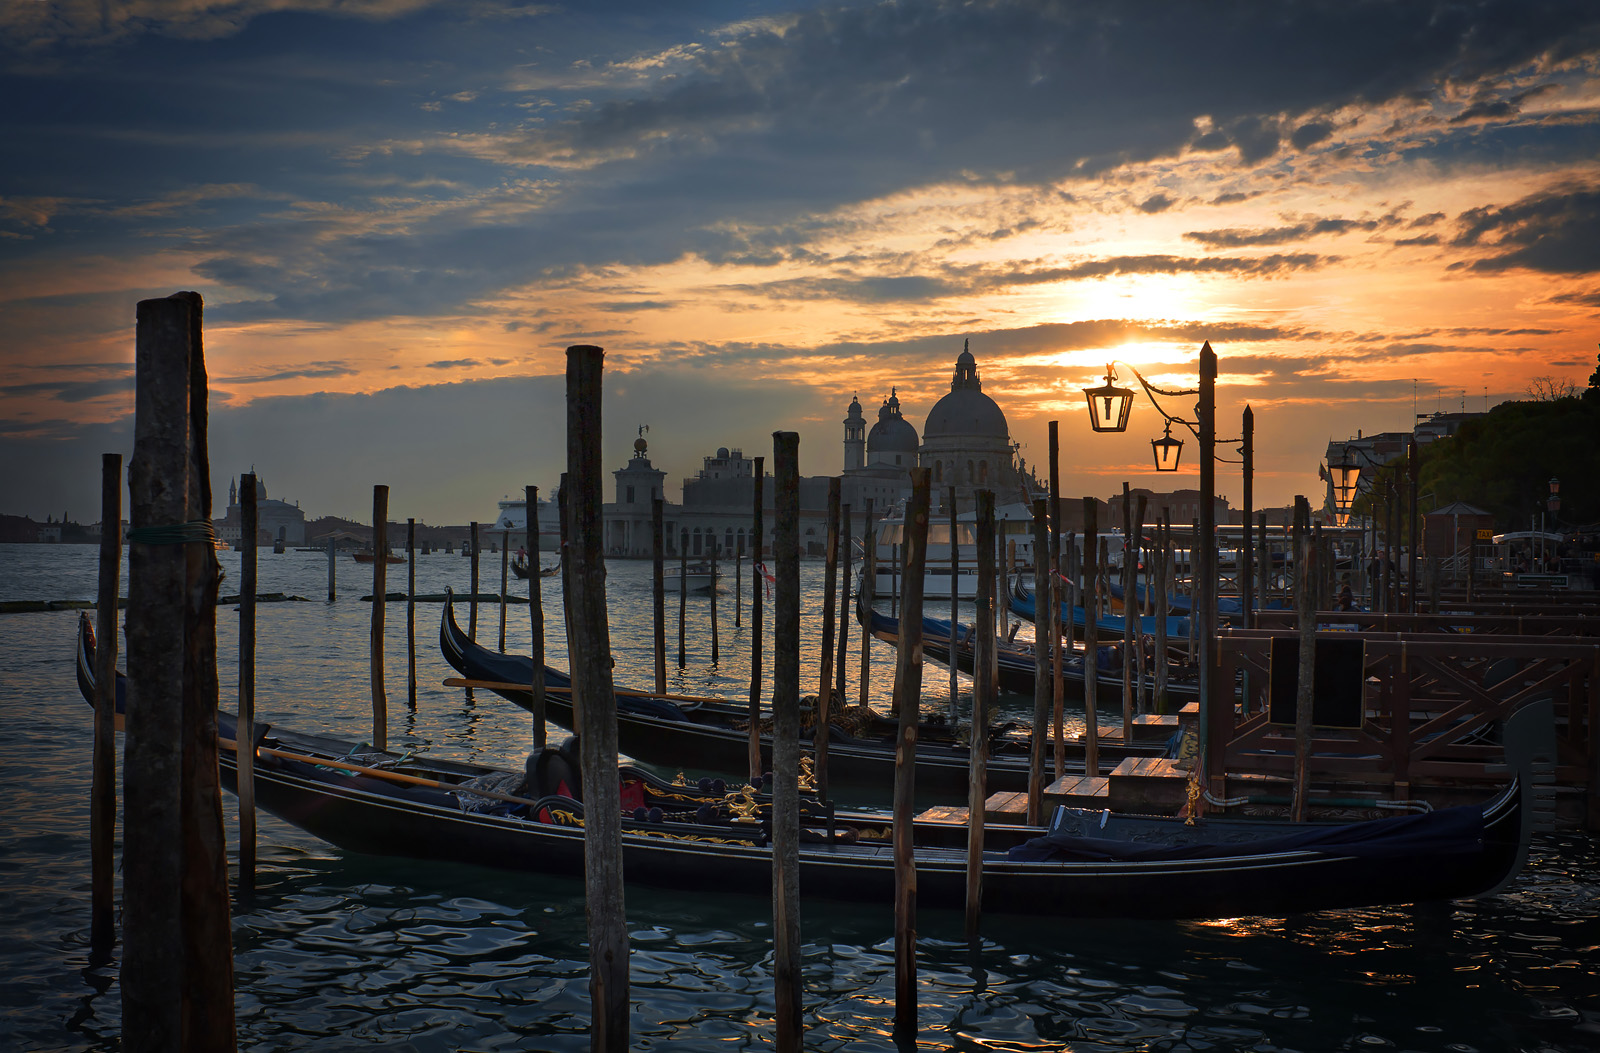 Venecia_Muelle_San_Marcos_full_res_1600